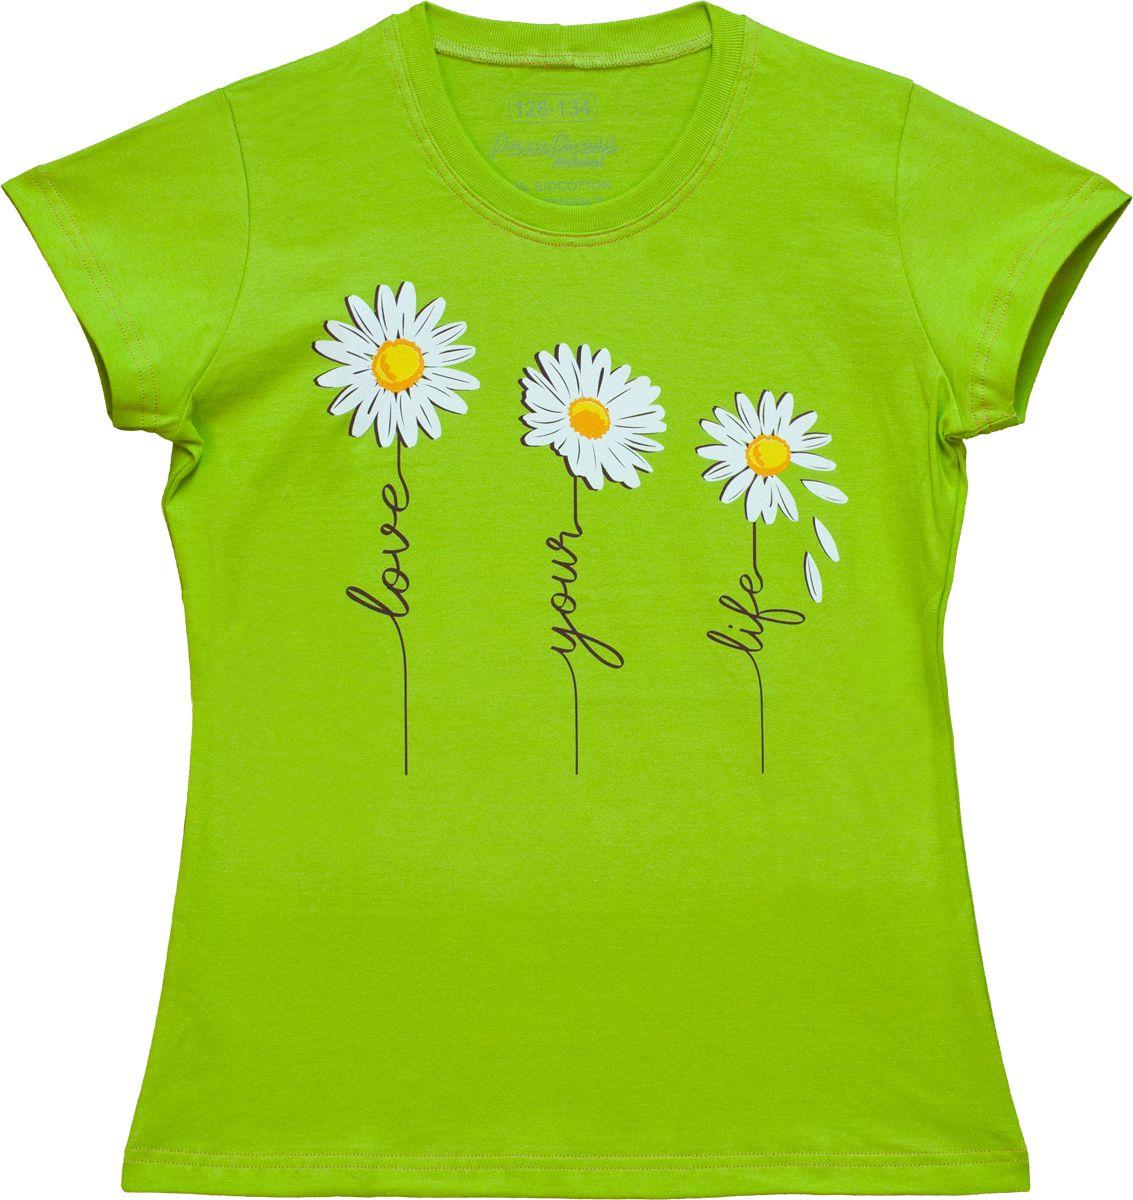 Lány rövid ujjú póló (Margaréta virág) /RPVIR21024/